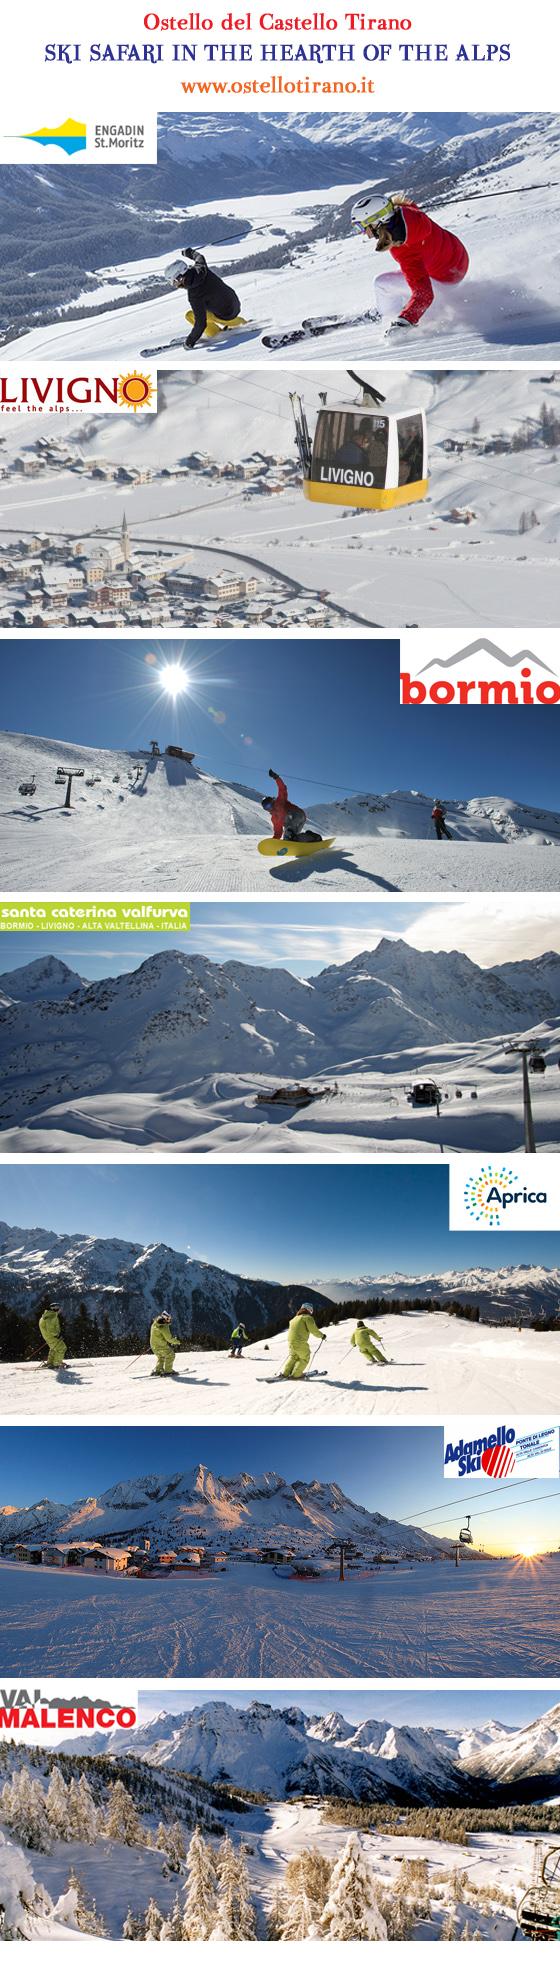 offerta settimana bianca ski safari livigno bormio valfurva st moritz aprica valmalenco trenino rosso diavolezza